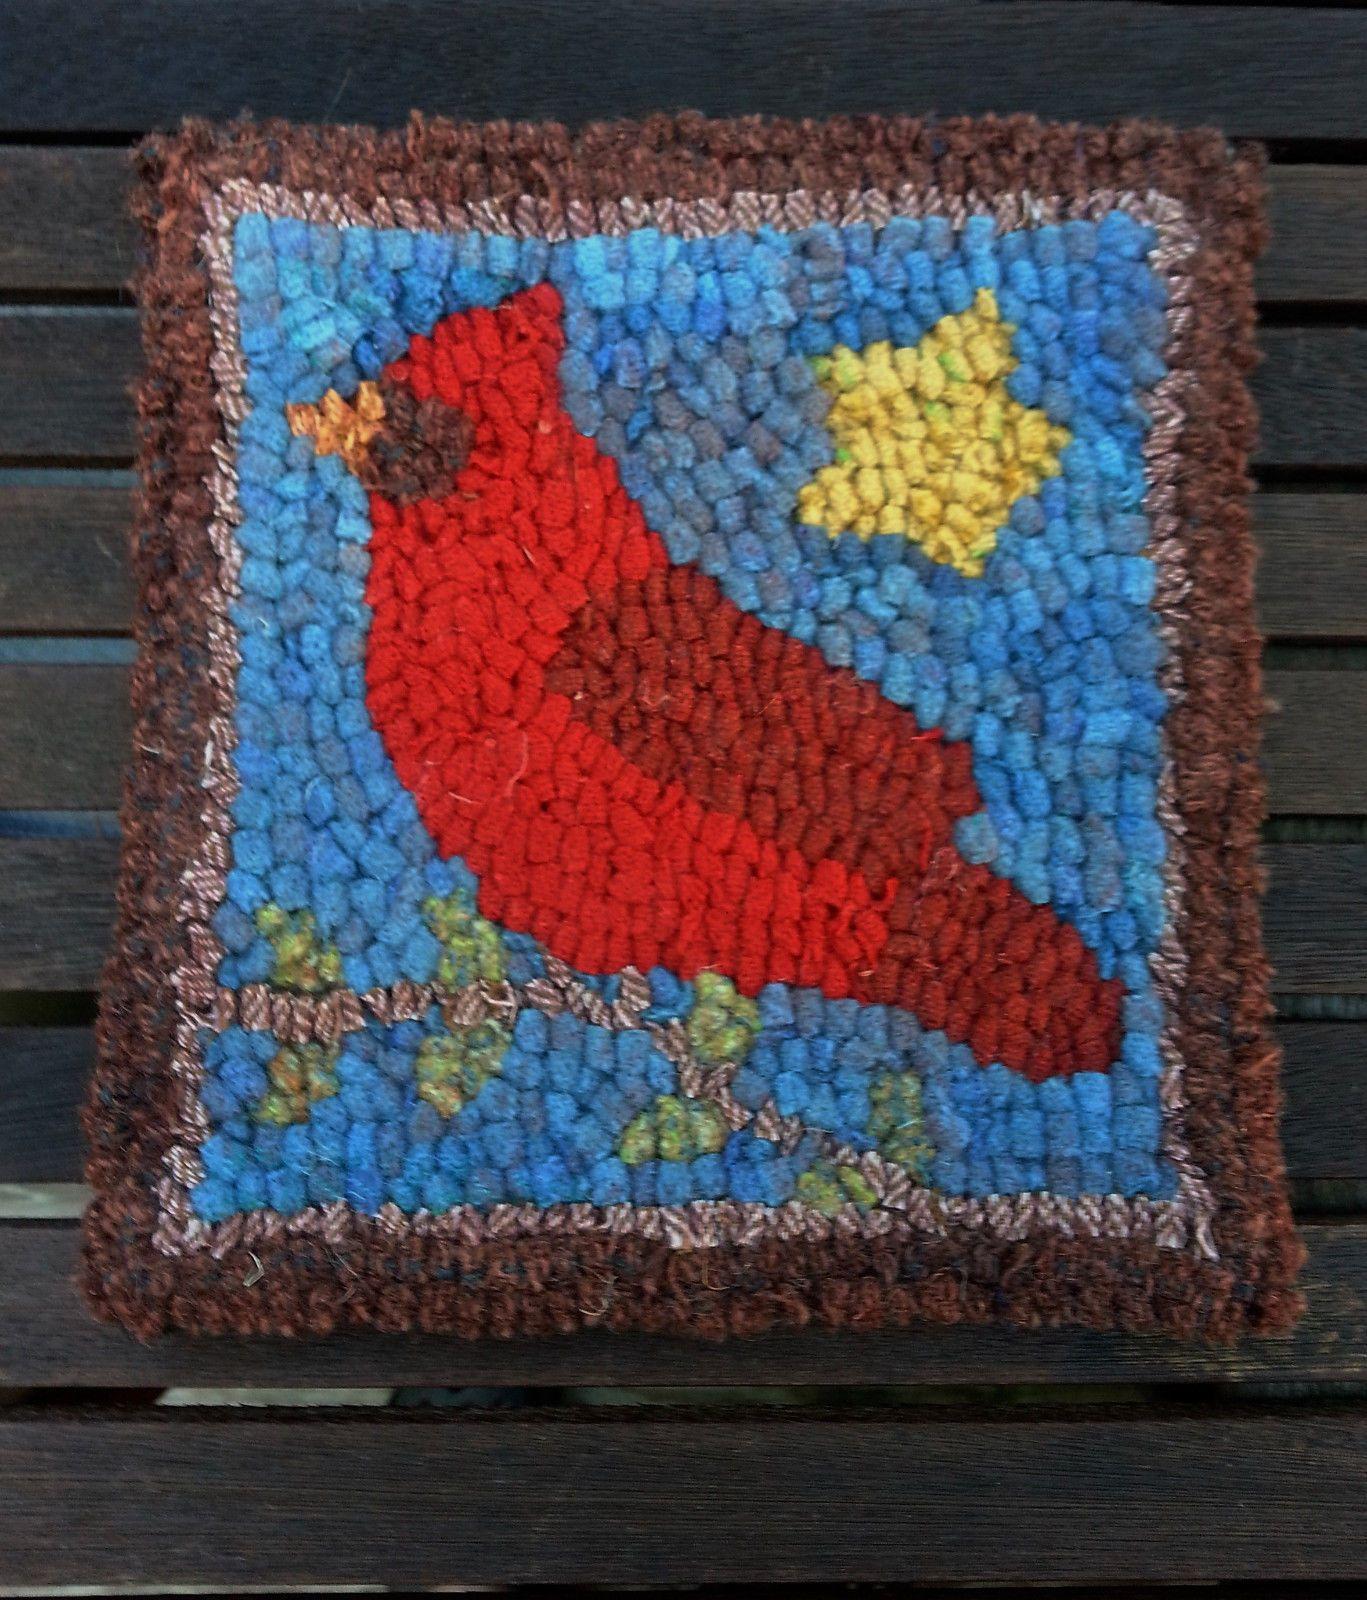 Primitive Hooking Kits 157030: Cardinal On Branch Primitive Rug Hooking Kit  With #8 Cut